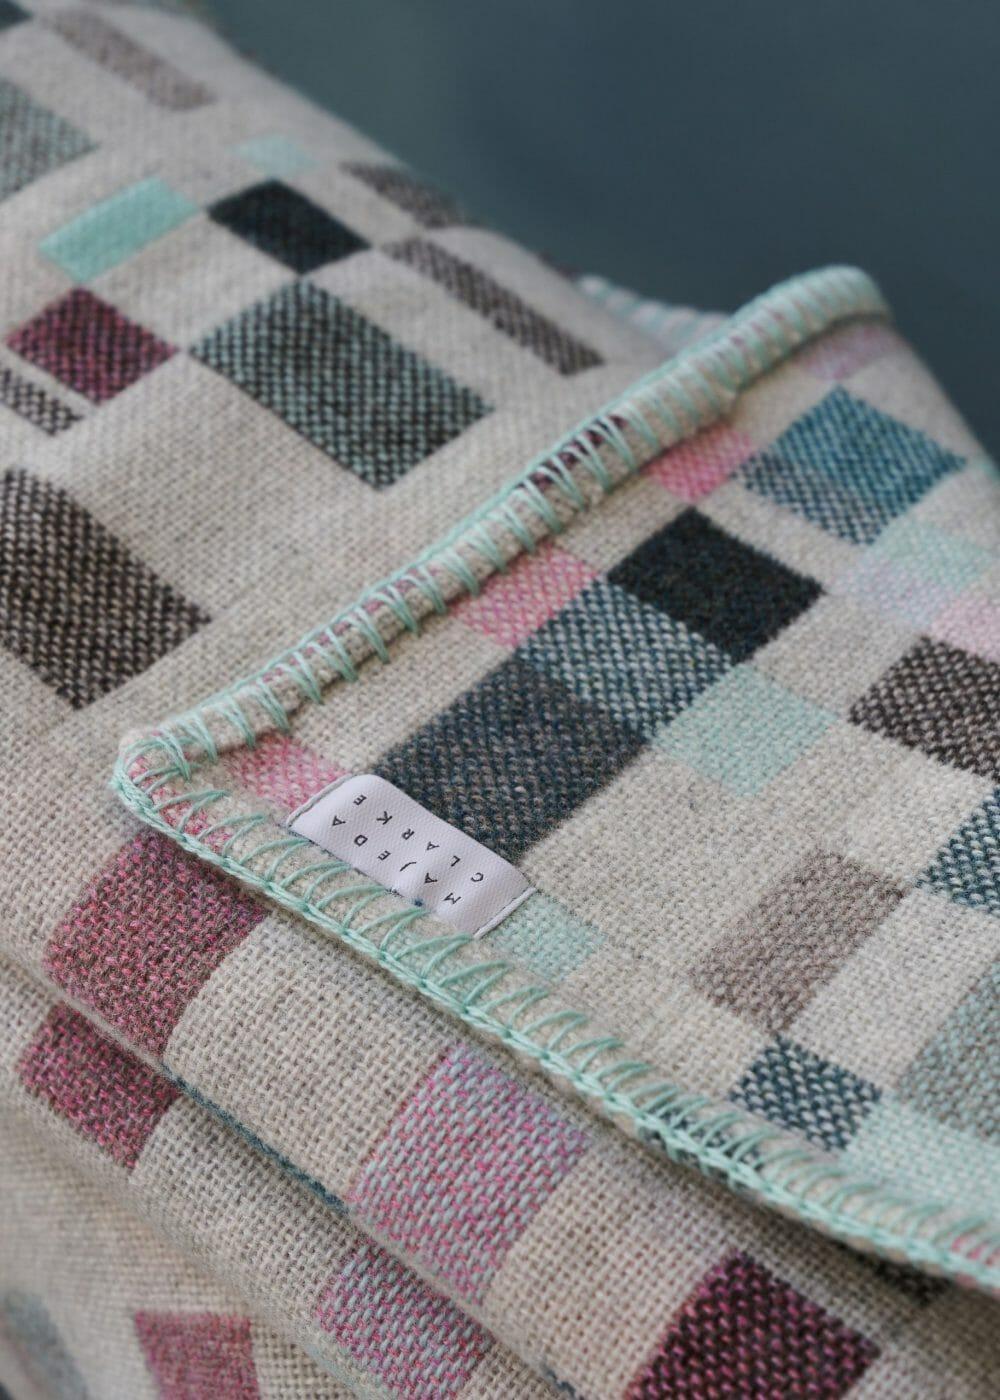 macaron-sorbet-blanket-textiles-throw-design-fabric-homeware-designer